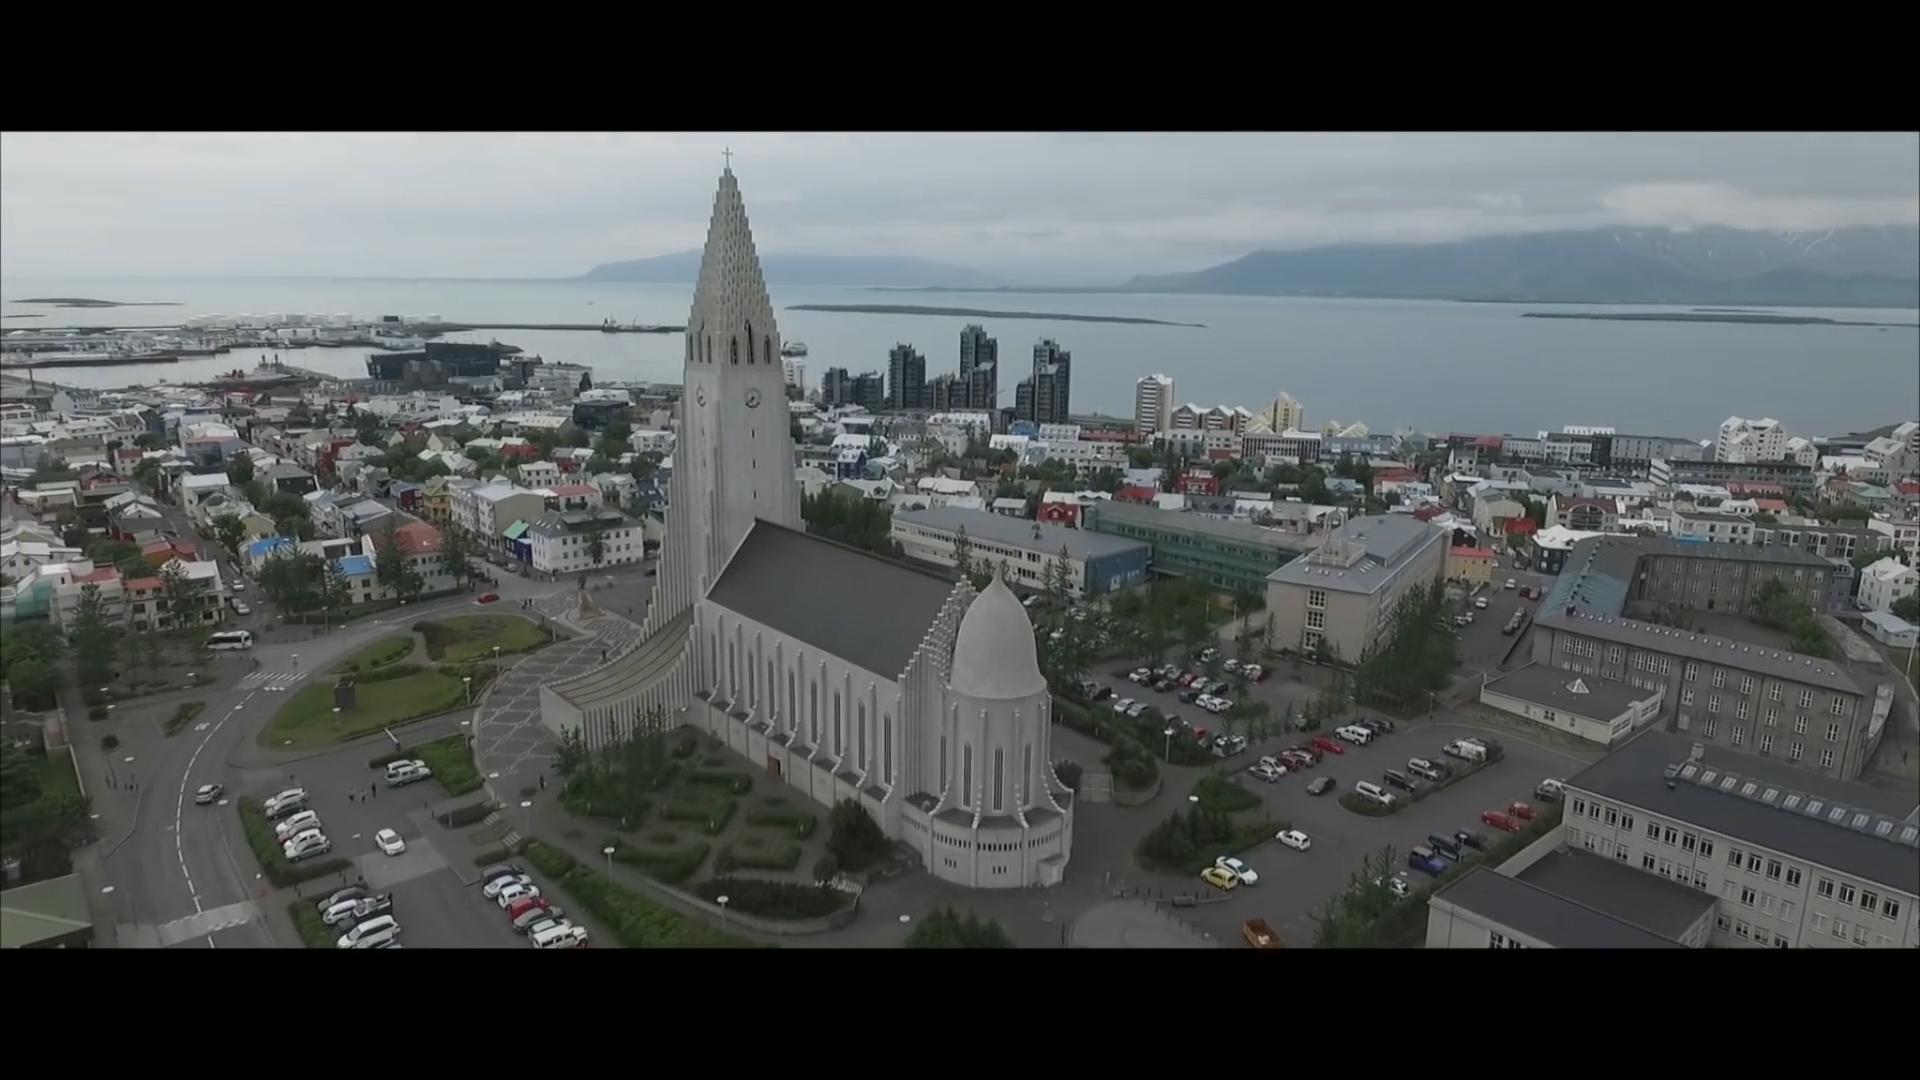 jim-west-central-church-iceland-aerial-6